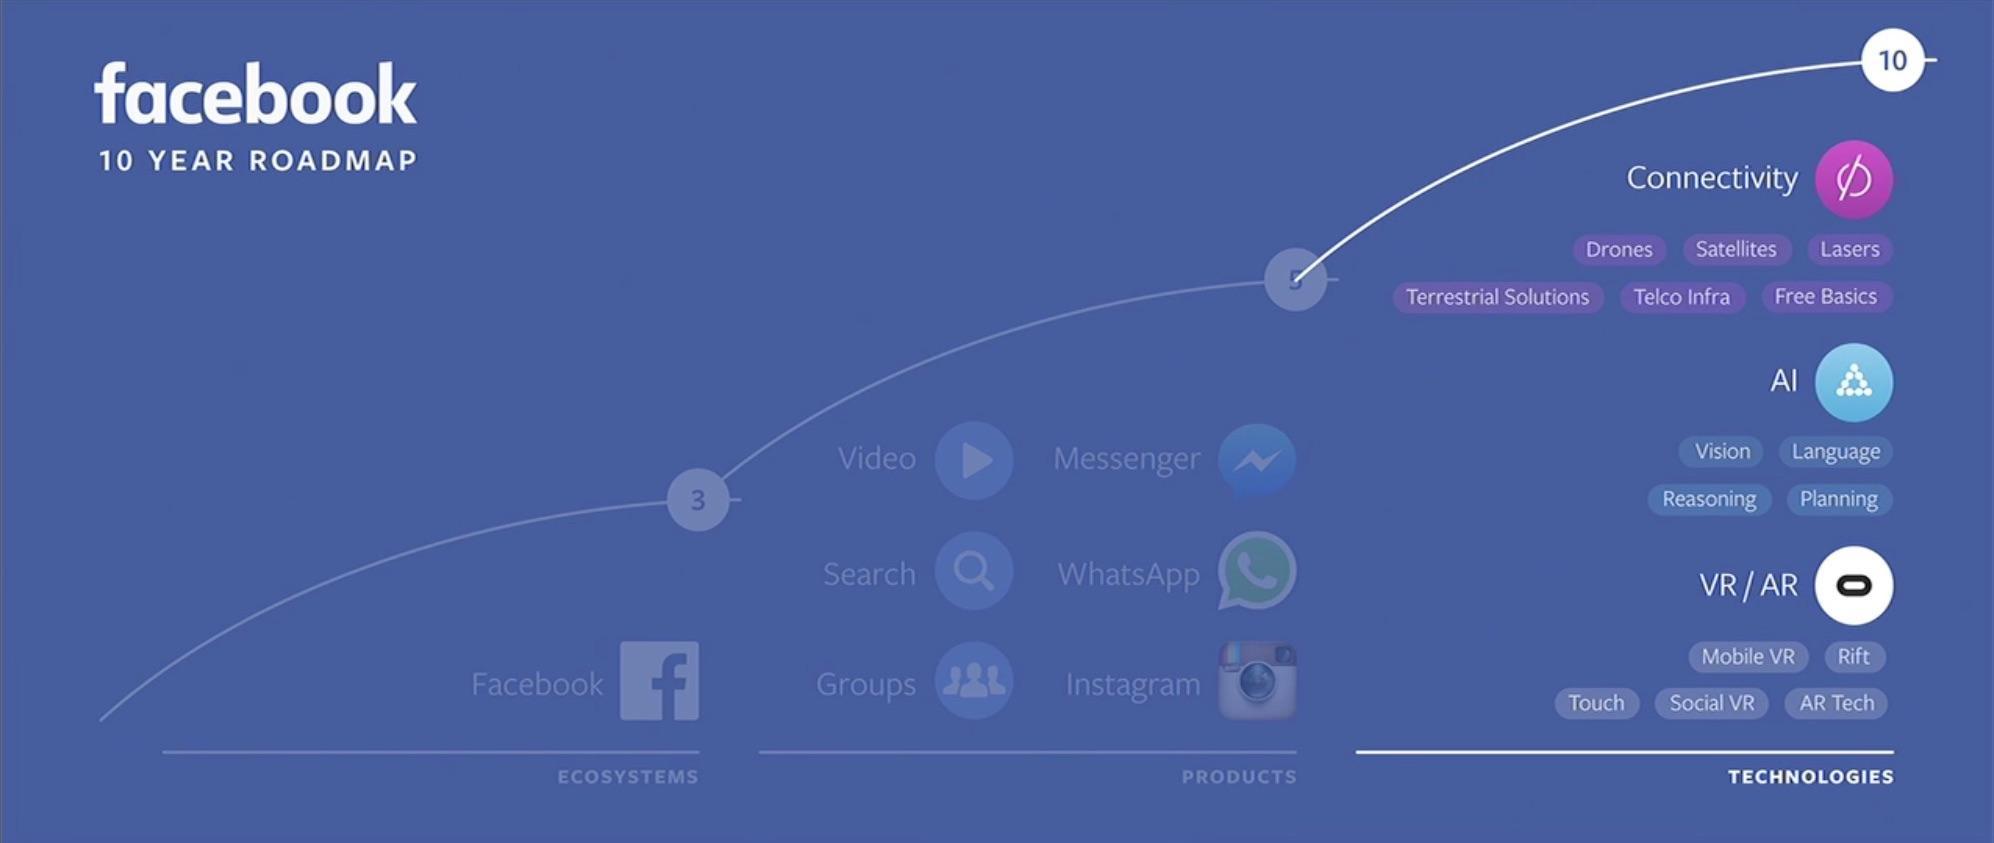 facebook-10-year-roadmap-2016